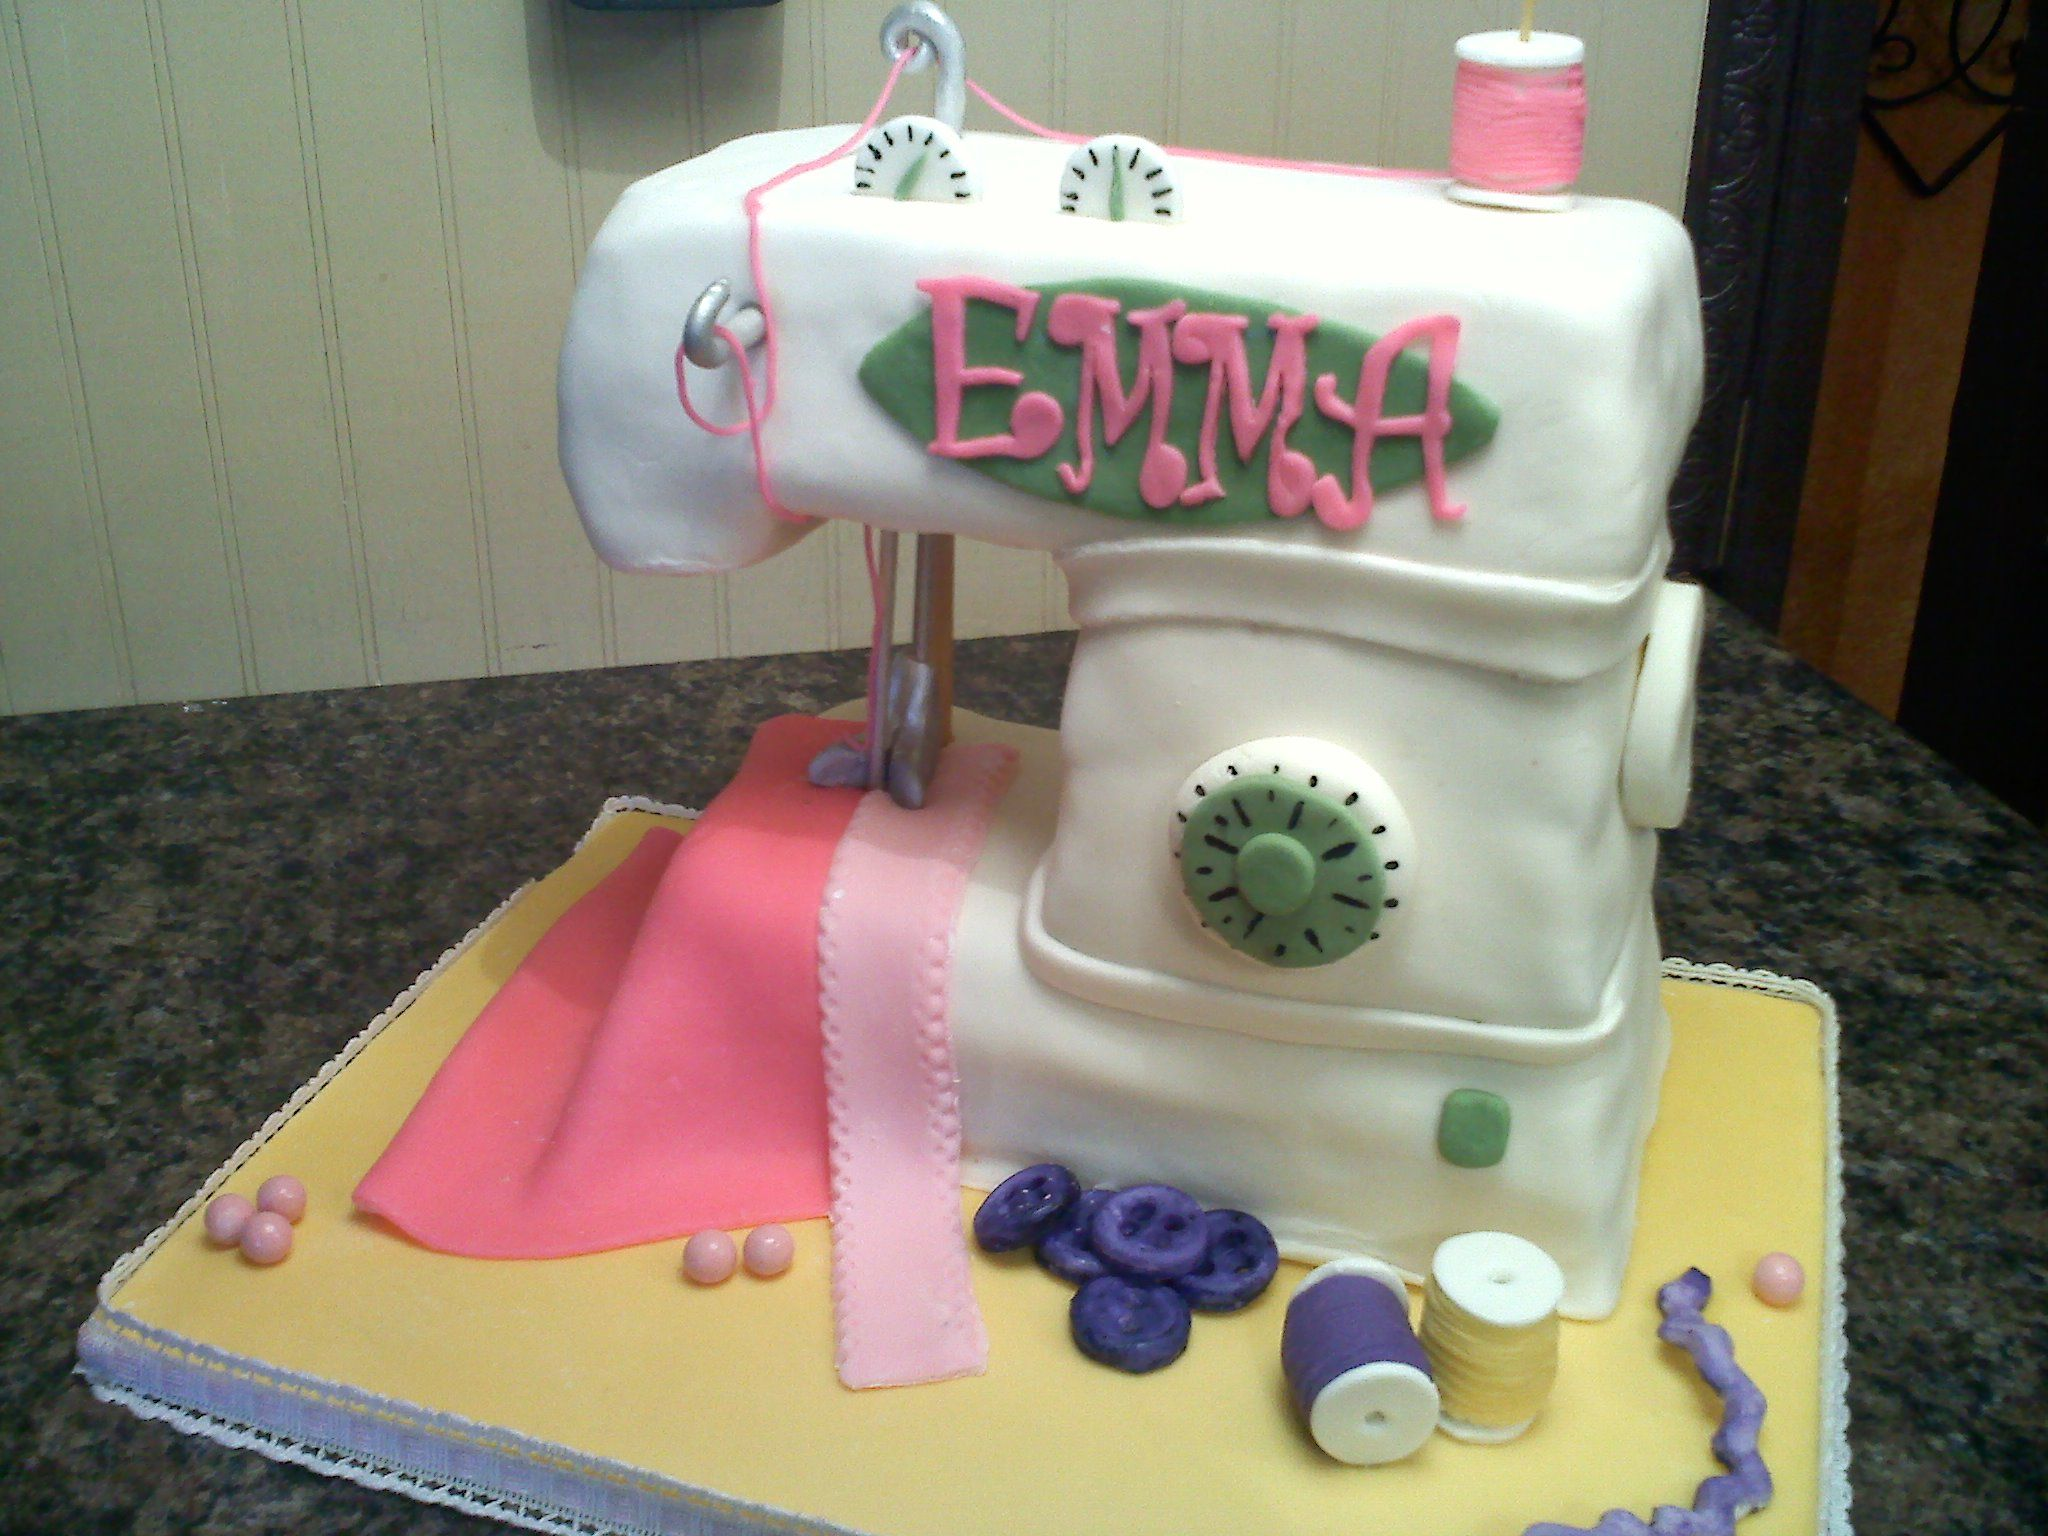 Embroidery Machine Cake | Makaroka.com